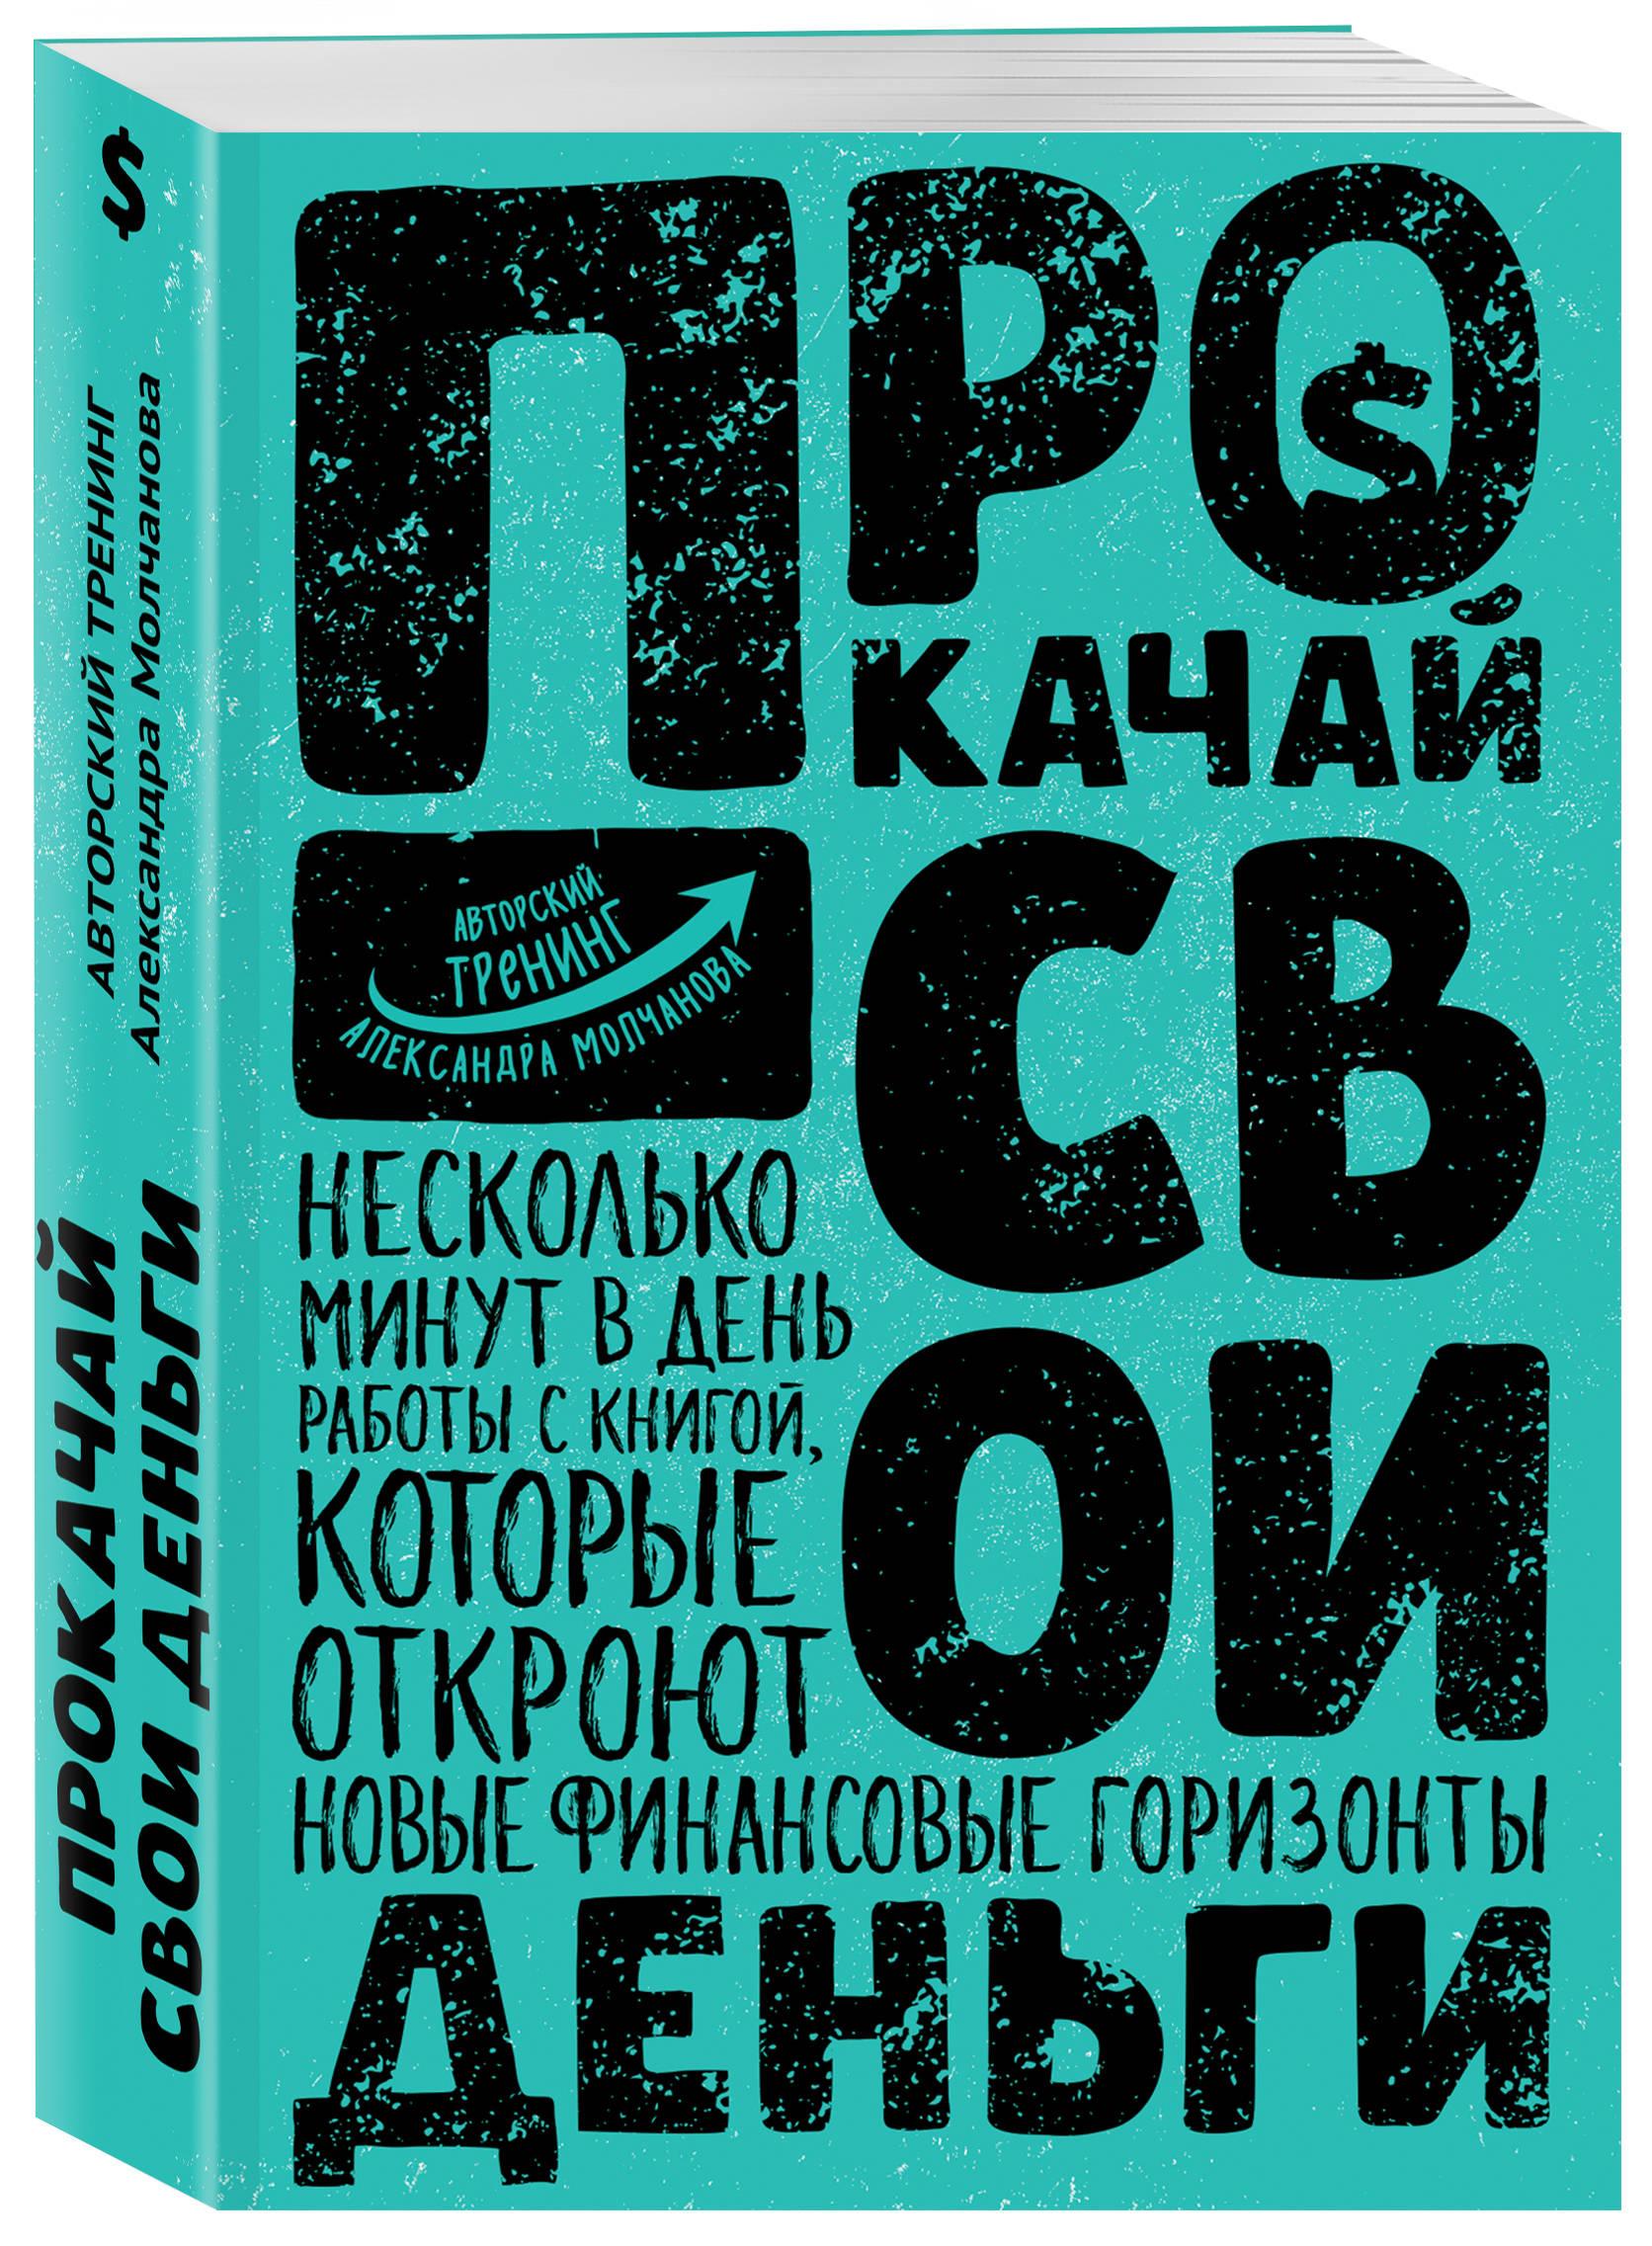 Молчанов Александр Владимирович Прокачай свои деньги прокачай свои деньги